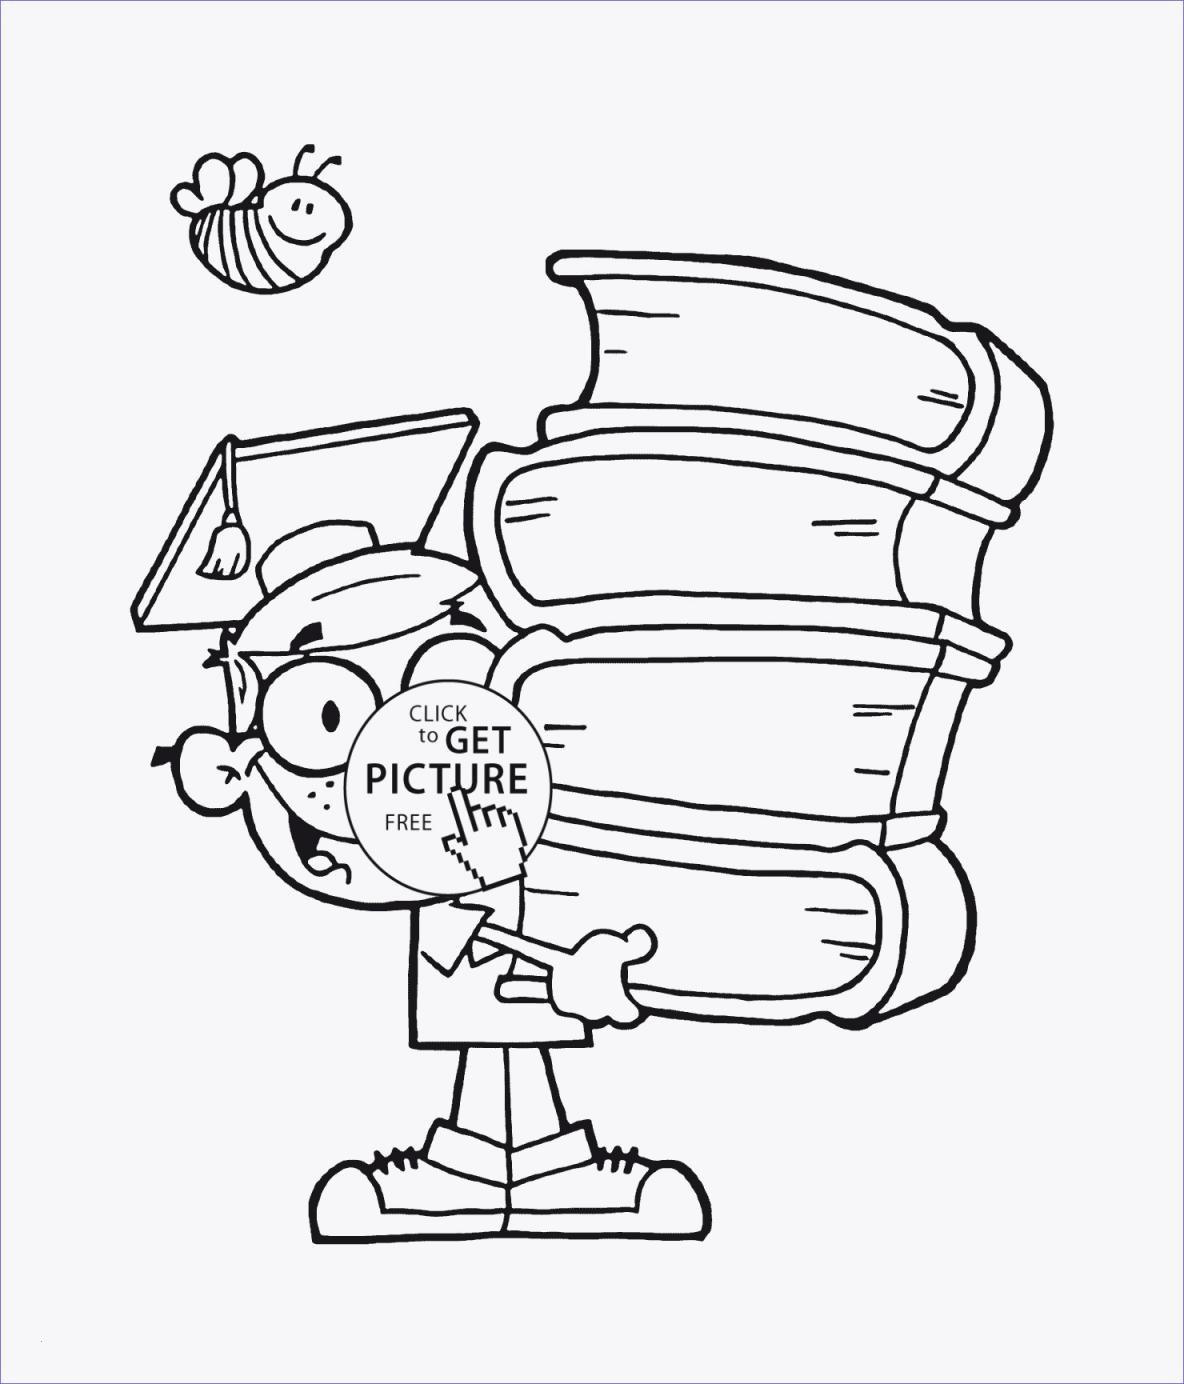 Ninjago Lloyd Ausmalbild Einzigartig Malvorlagen Igel Frisch Igel Grundschule 0d Archives Uploadertalk Bilder